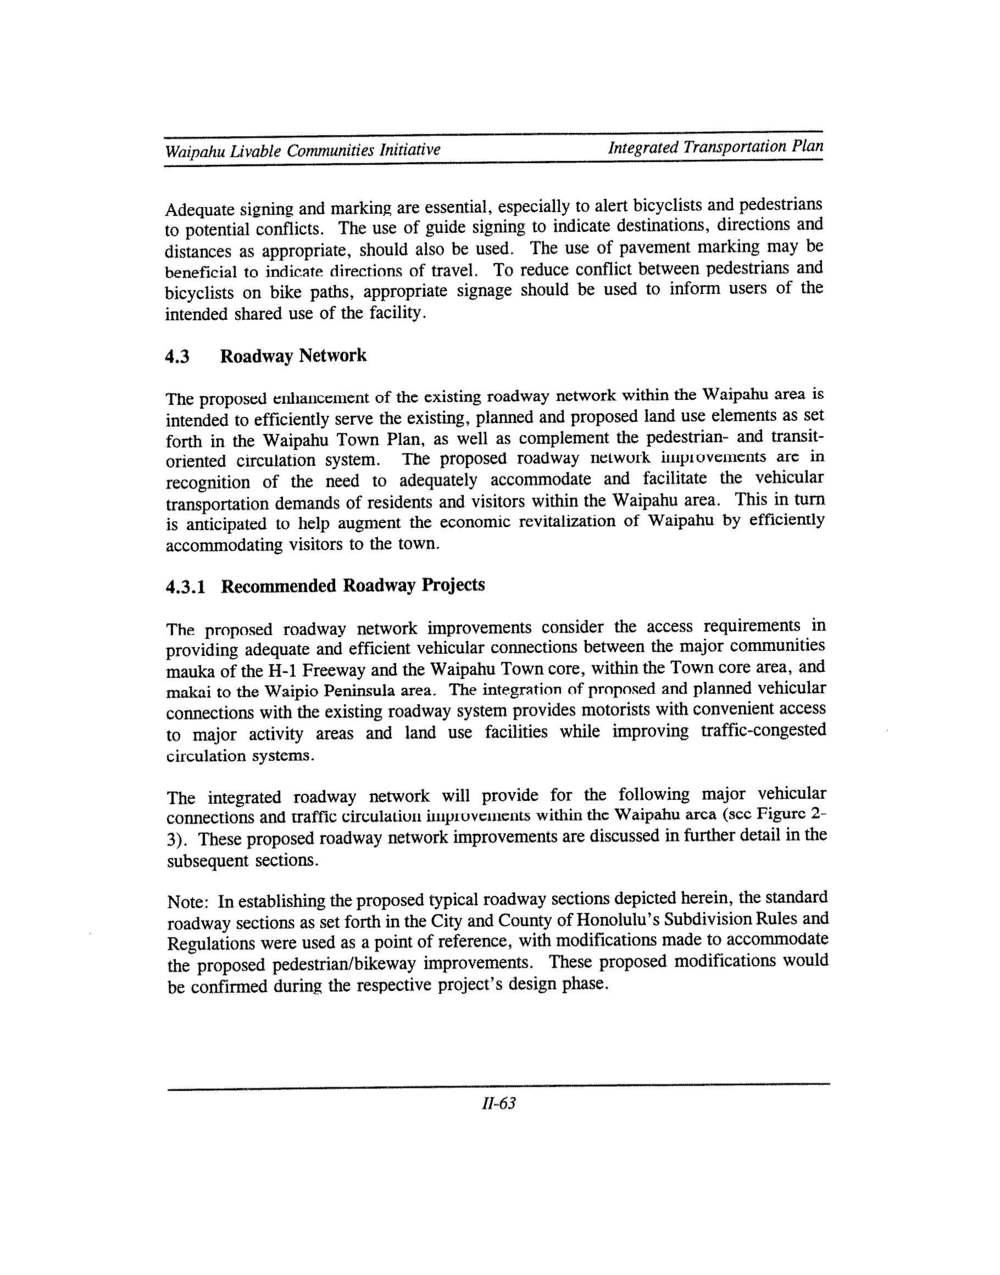 160531_WaipahuLivableCommunities(1998)_Page_078.jpg